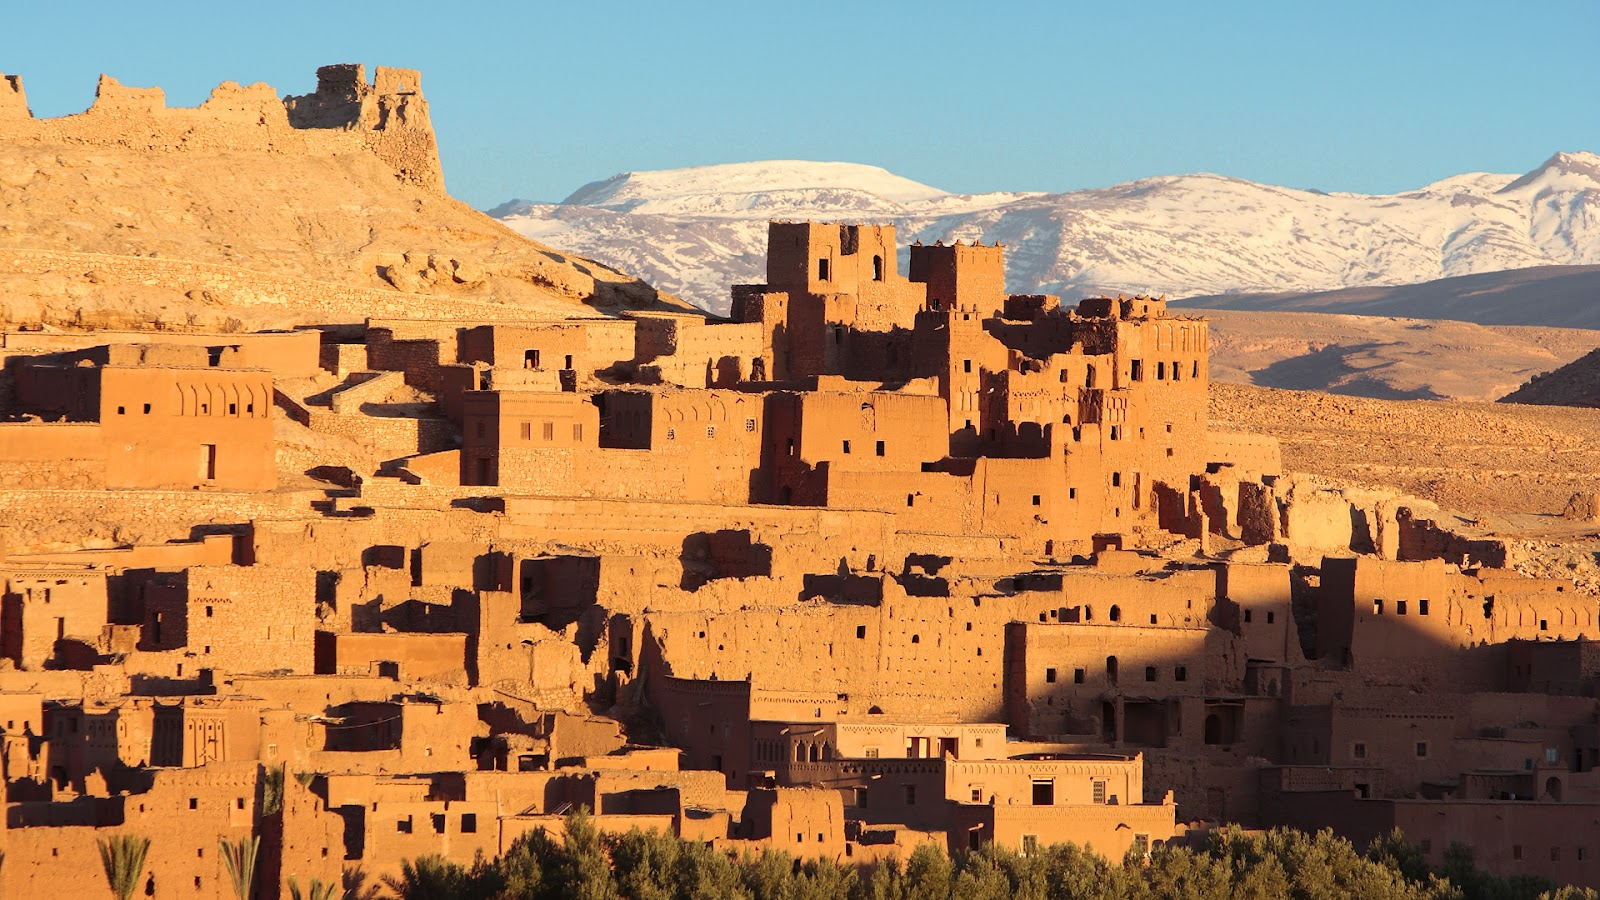 http://3.bp.blogspot.com/-CajwnR3v_qI/UAfRhOg_L1I/AAAAAAAADJA/UHVScTf-oHc/s1600/Kasbah+of+Ait+Benhaddou,+Morocco.jpg